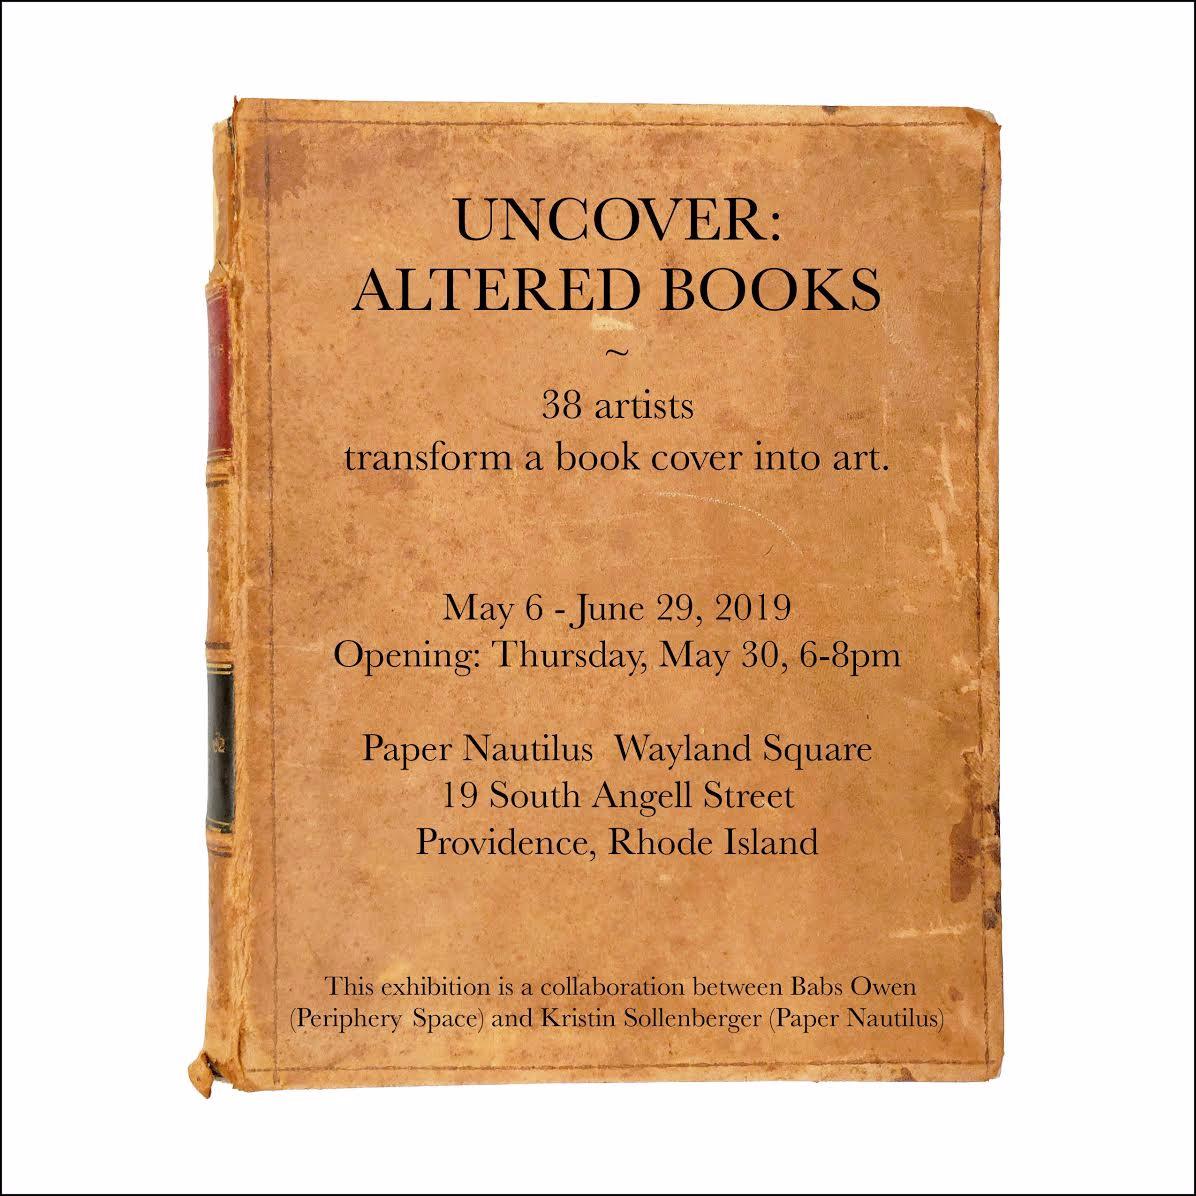 Uncover: Altered Books at Paper Nautilus